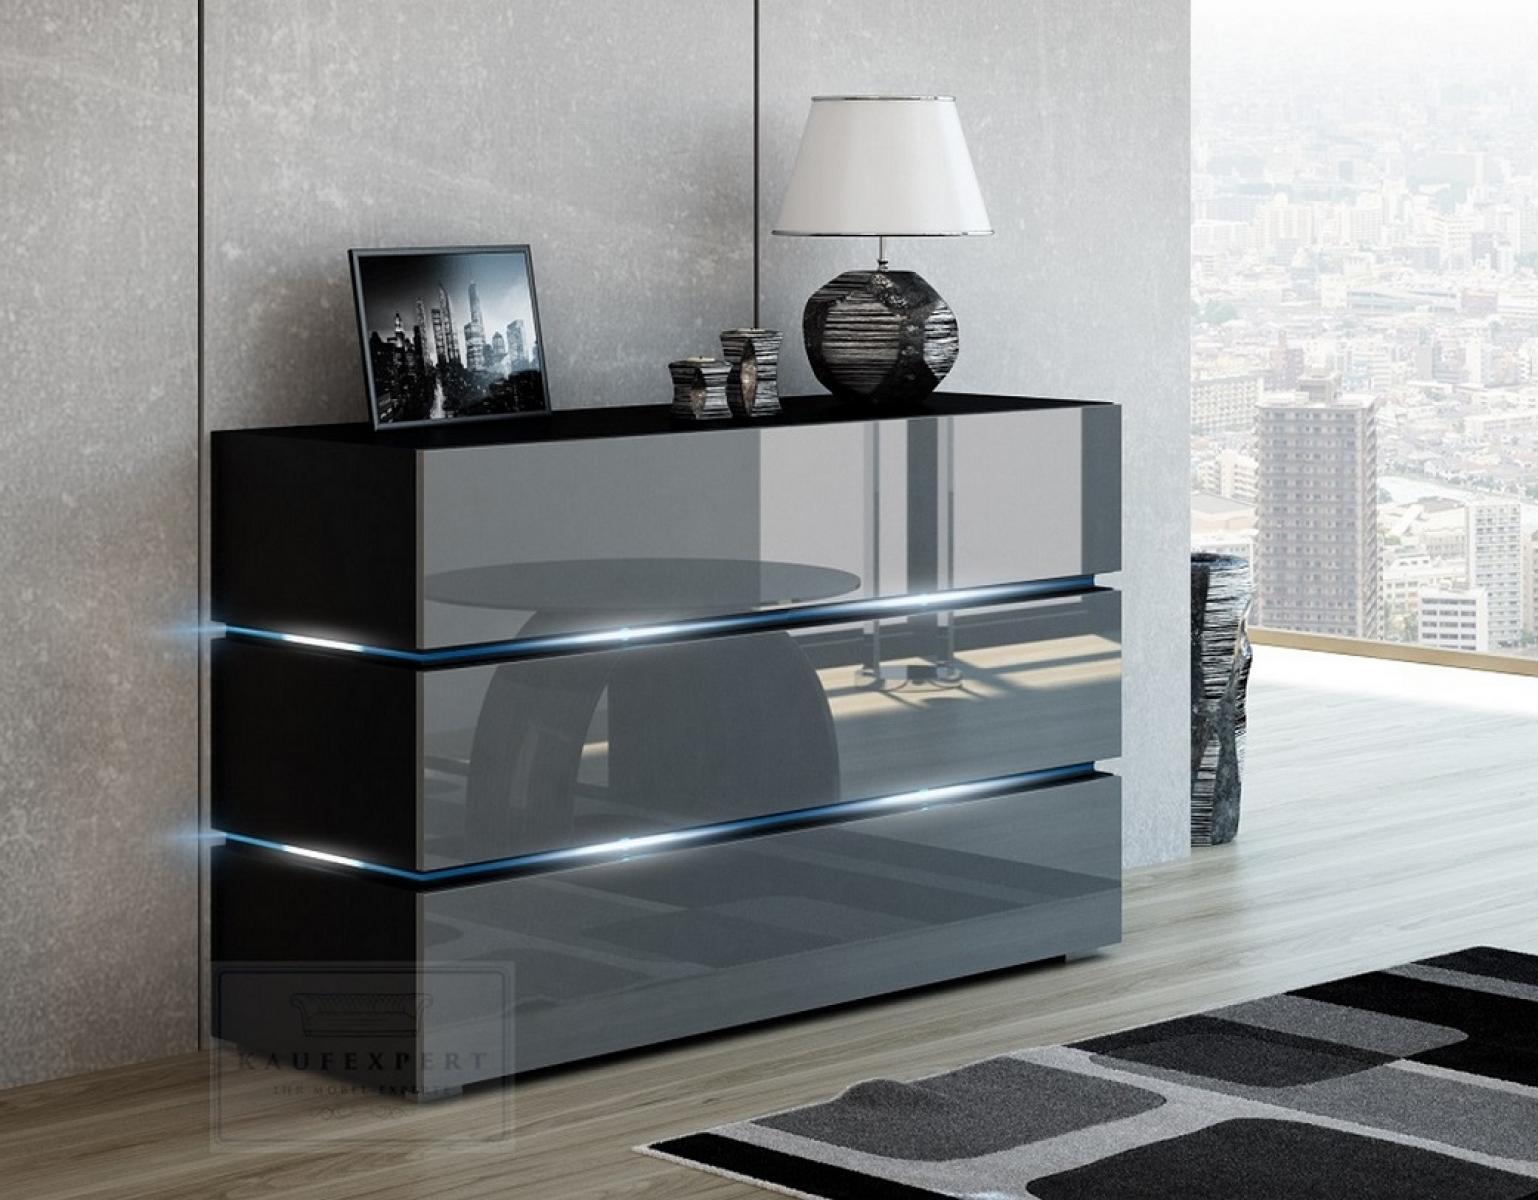 KAUFEXPERT Kommode Shine Sideboard 120 cm Grau Hochglanz